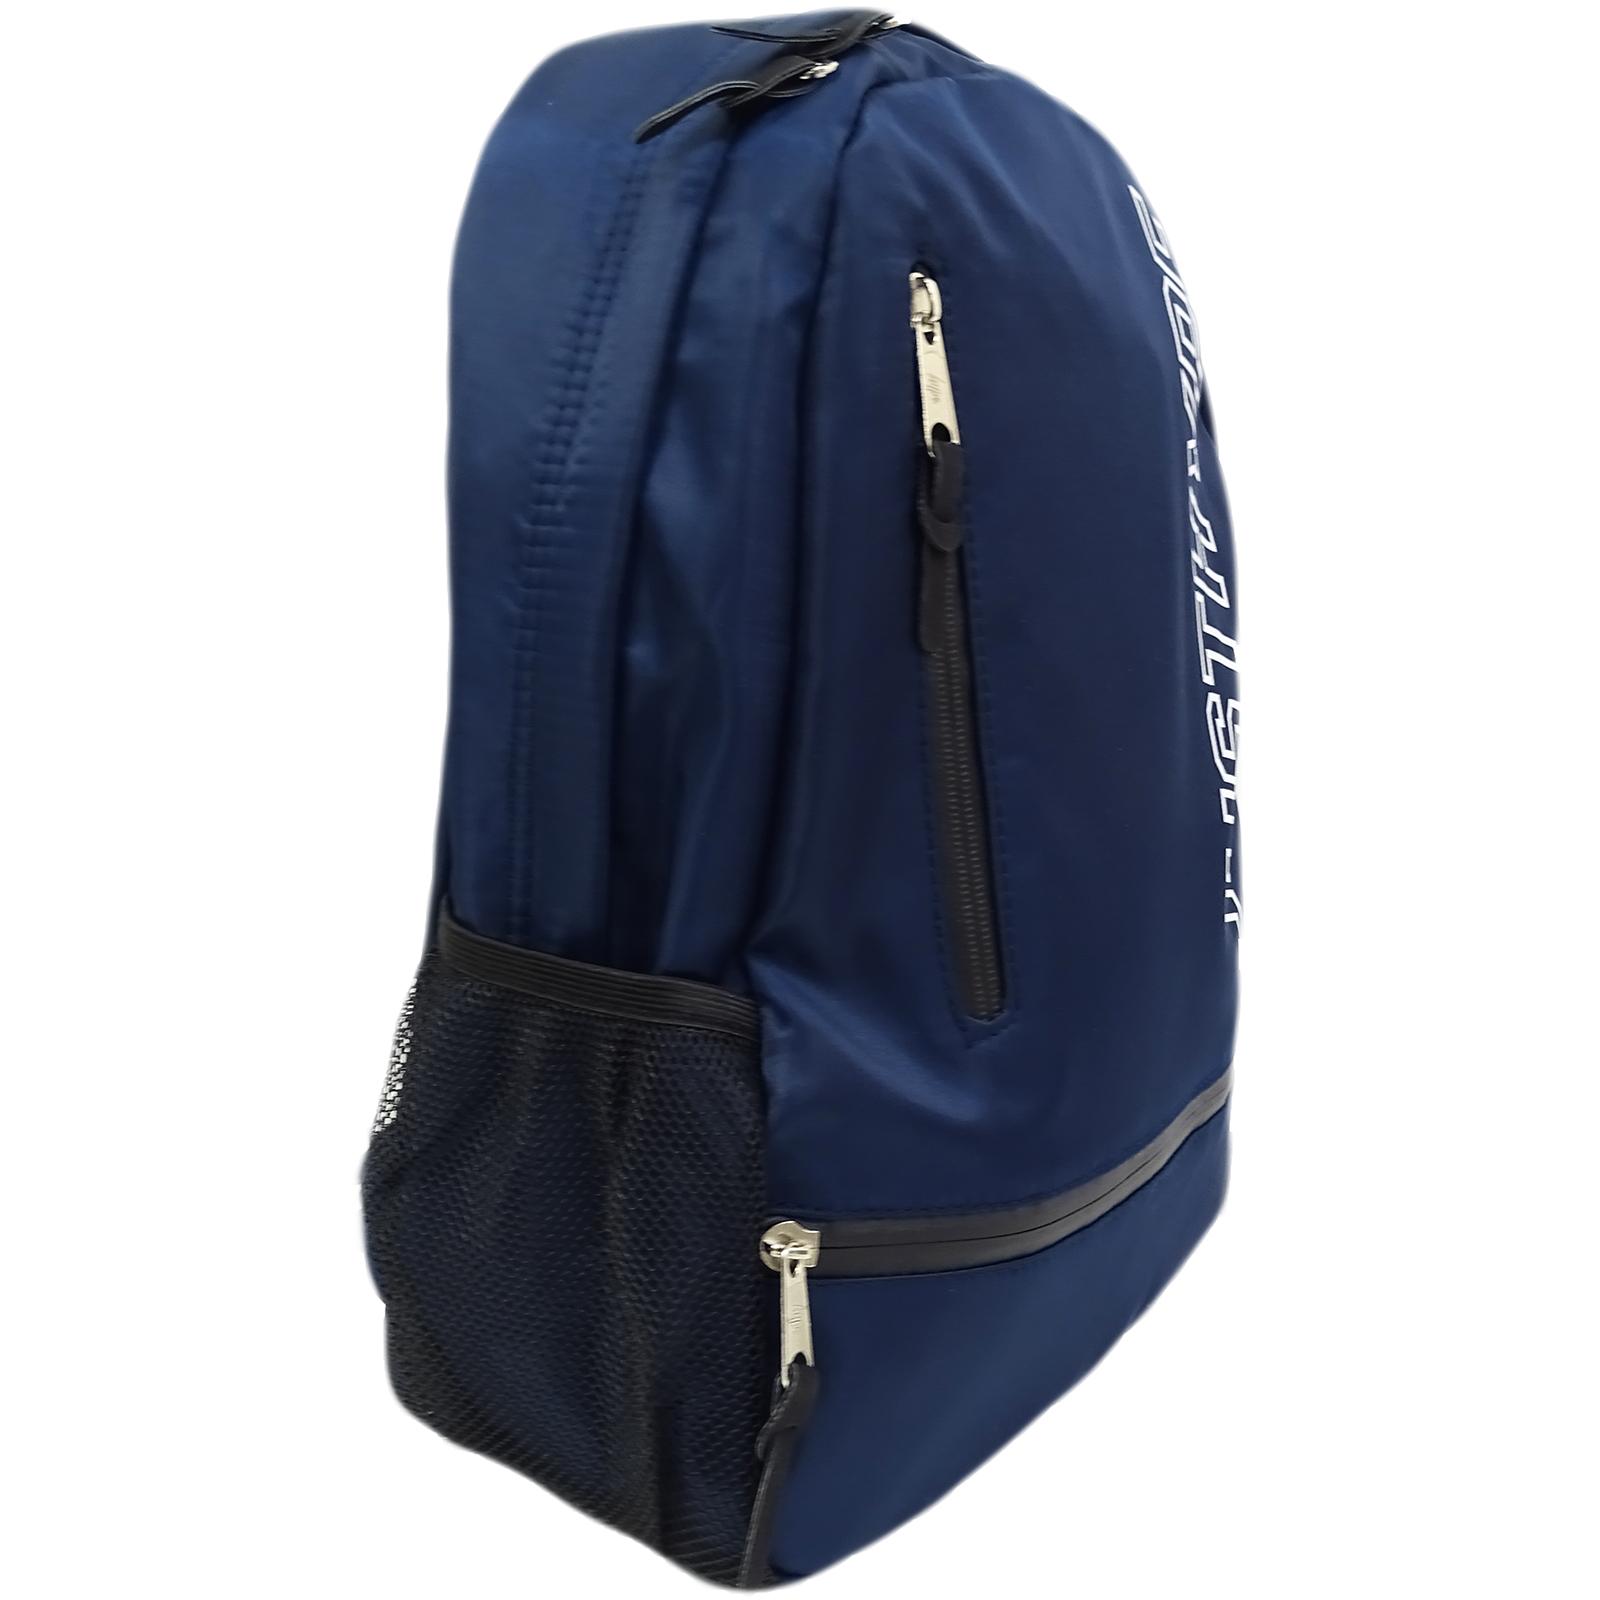 Unisexe-Hype-Sac-A-Dos-Ecole-Gym-SACS-pochettes-pencil-case miniature 86